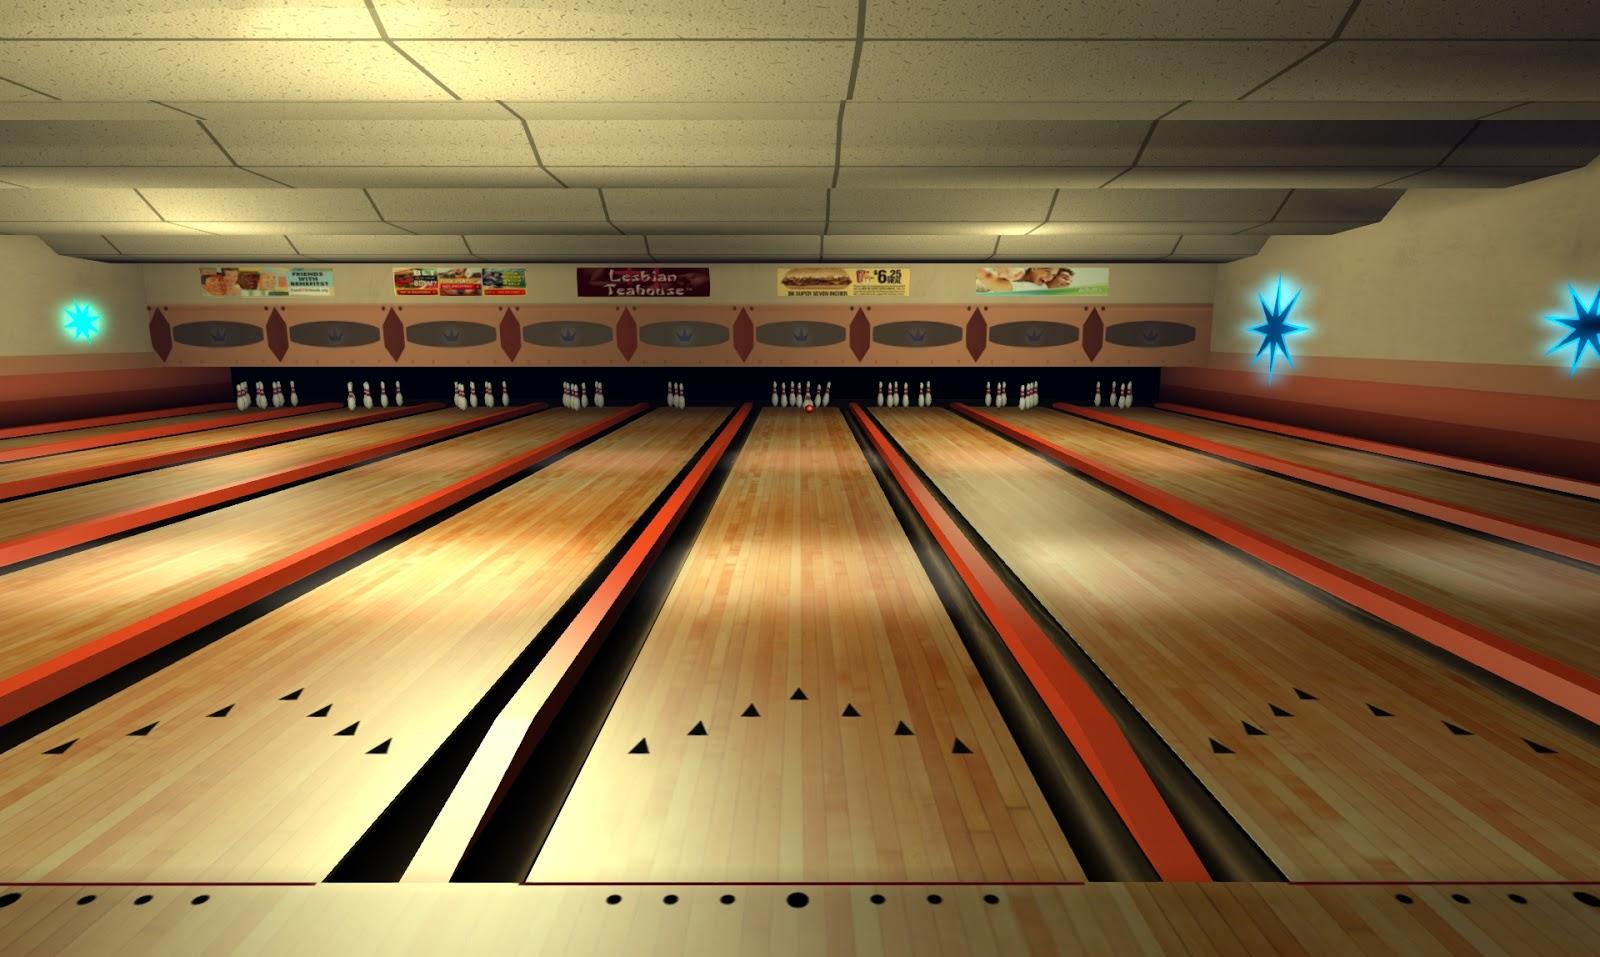 Bowlingbahn NeuГџ